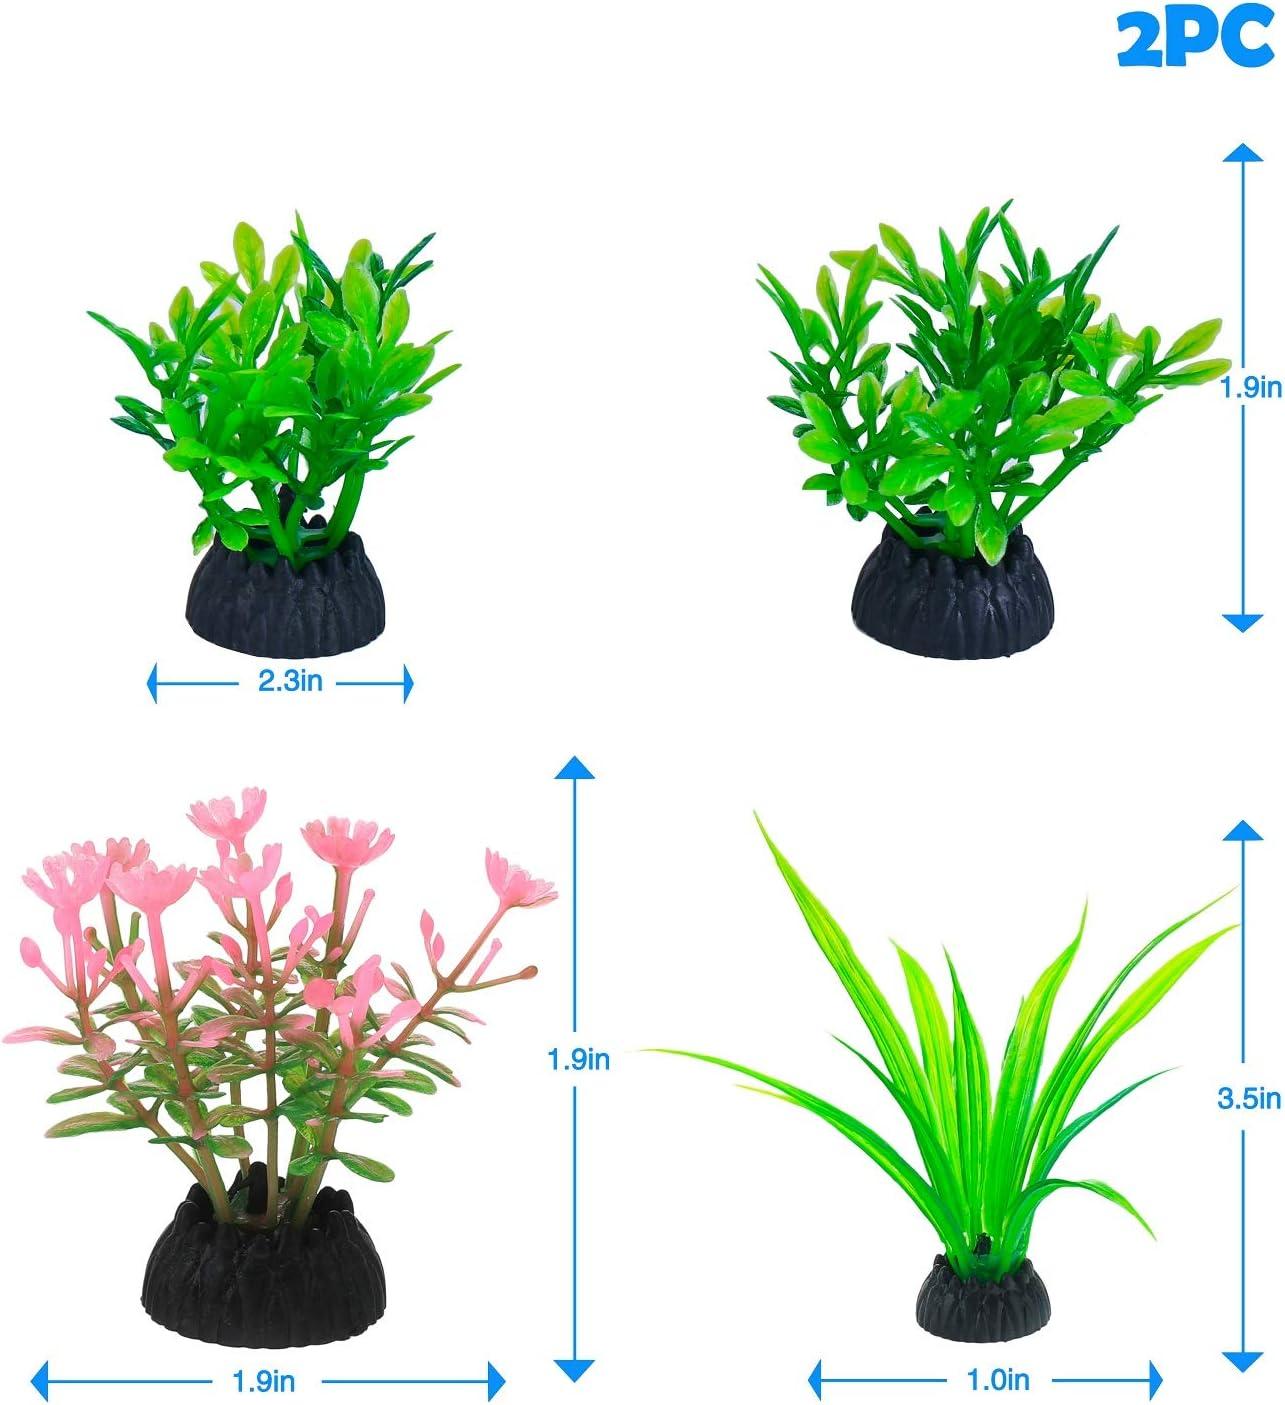 SEAHEEN Fish Tank Plant Aquarium Decoration Fish Tank Decoration Artificial Plastic Plant Green kit